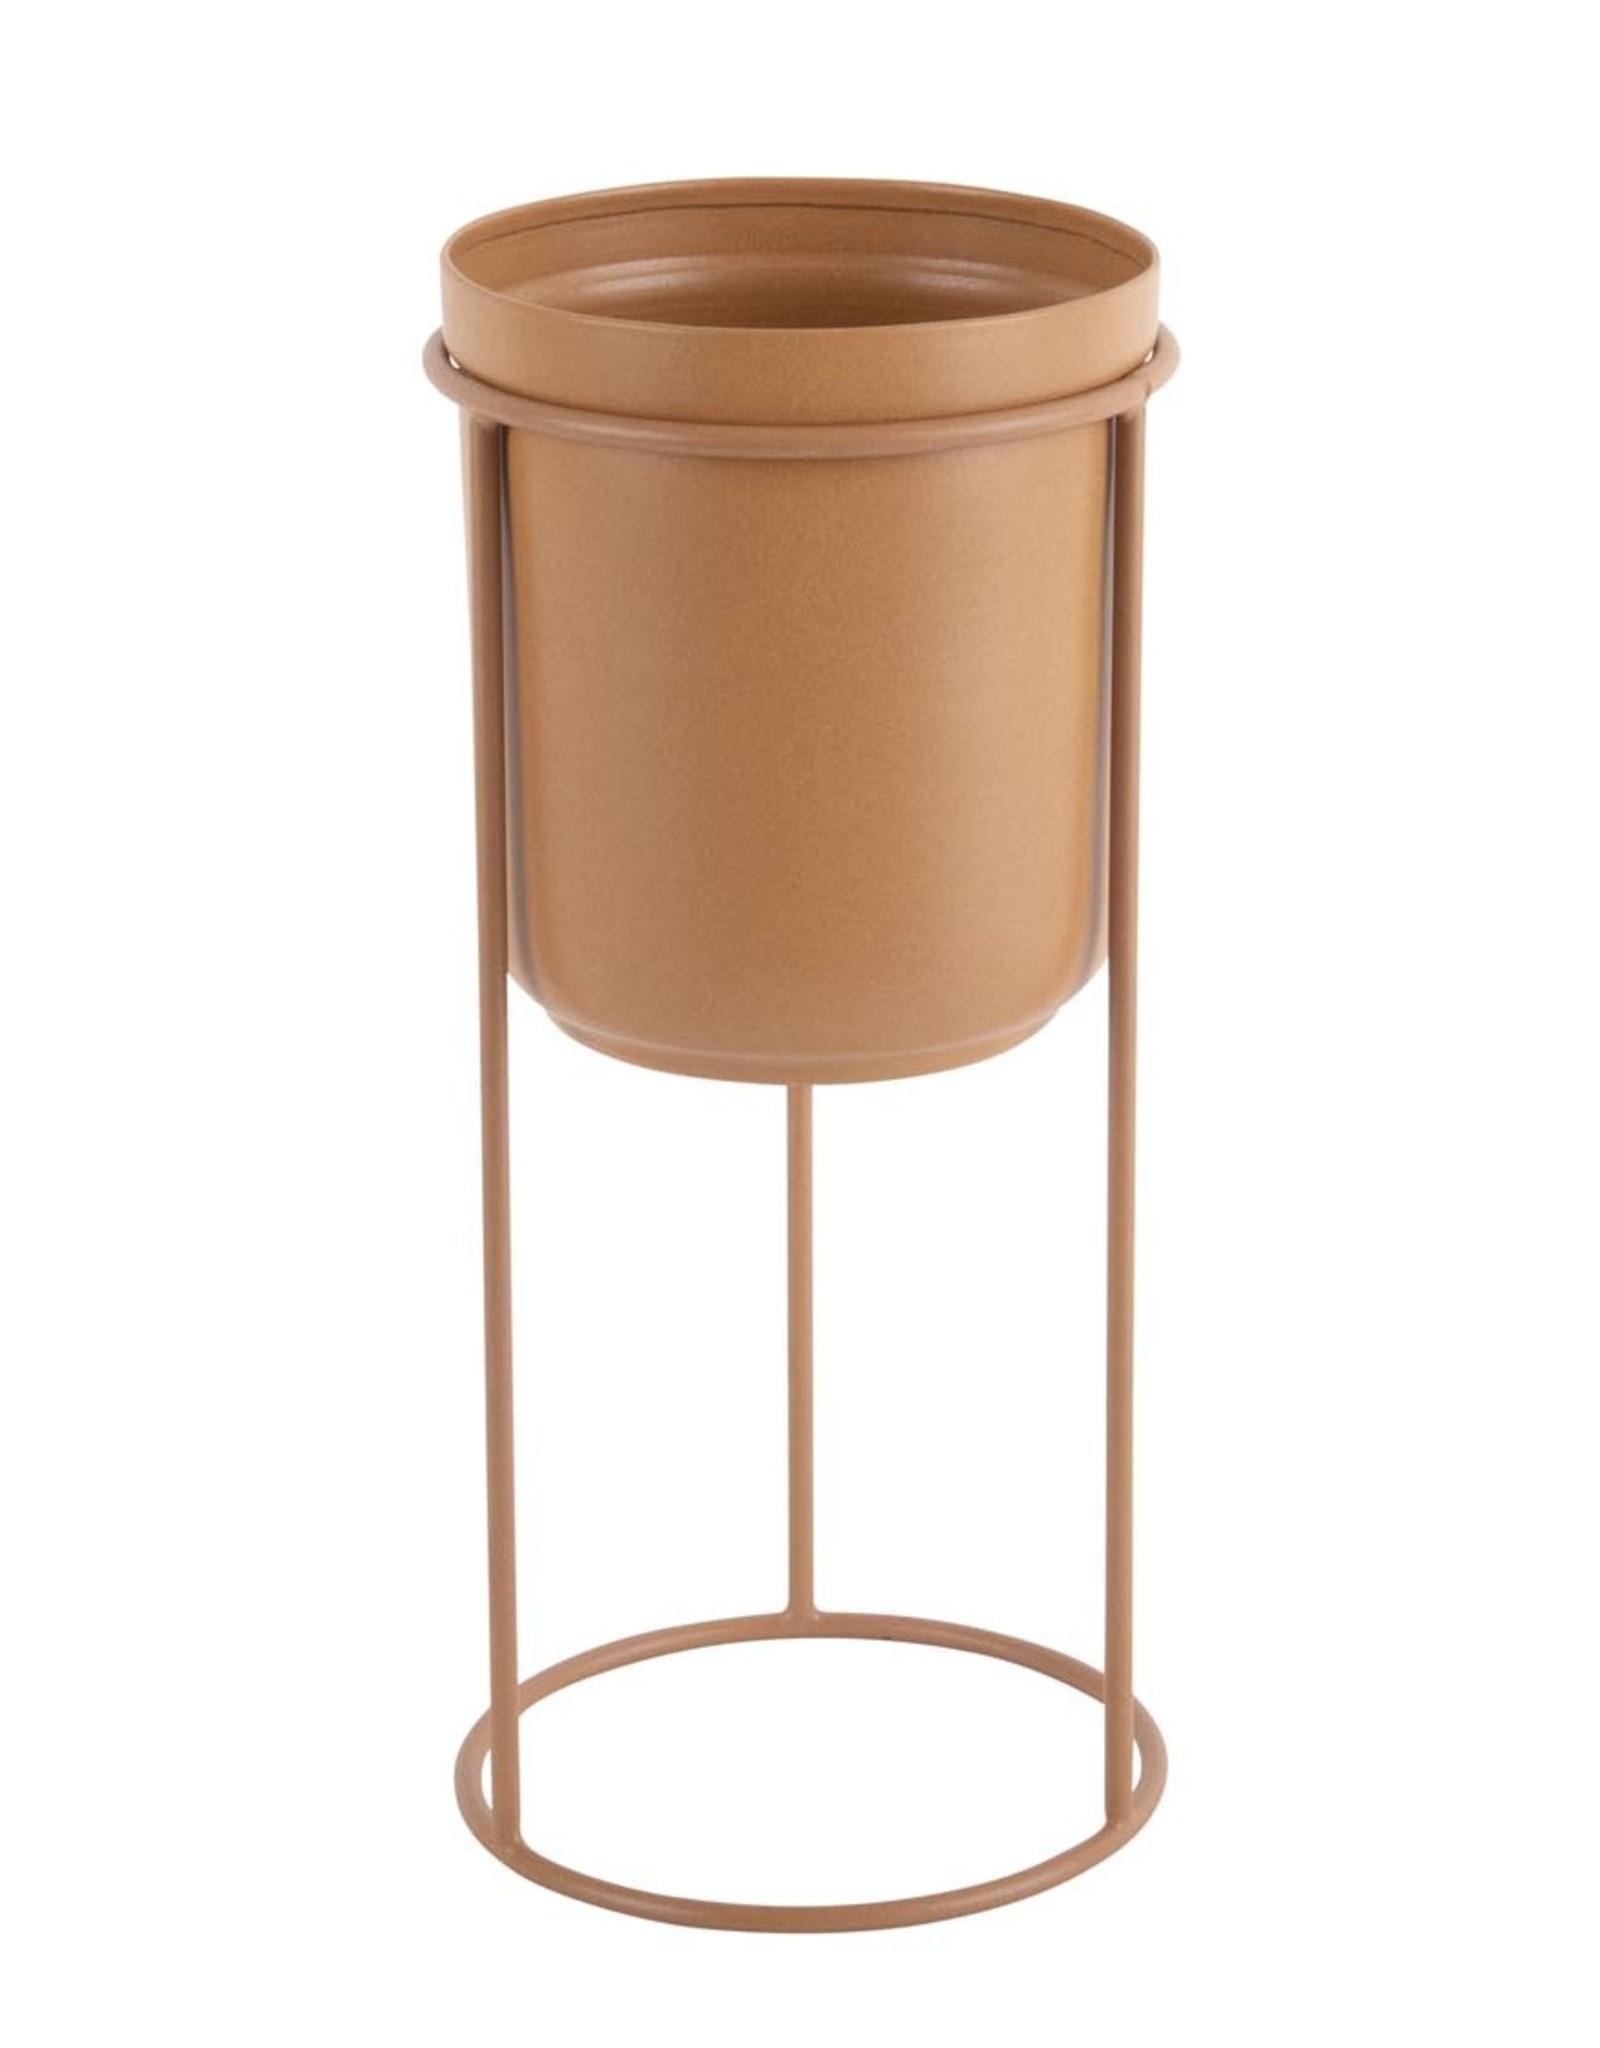 pt Tub on stand Ø17 h19 cm (total h32 cm) - Caramel brown